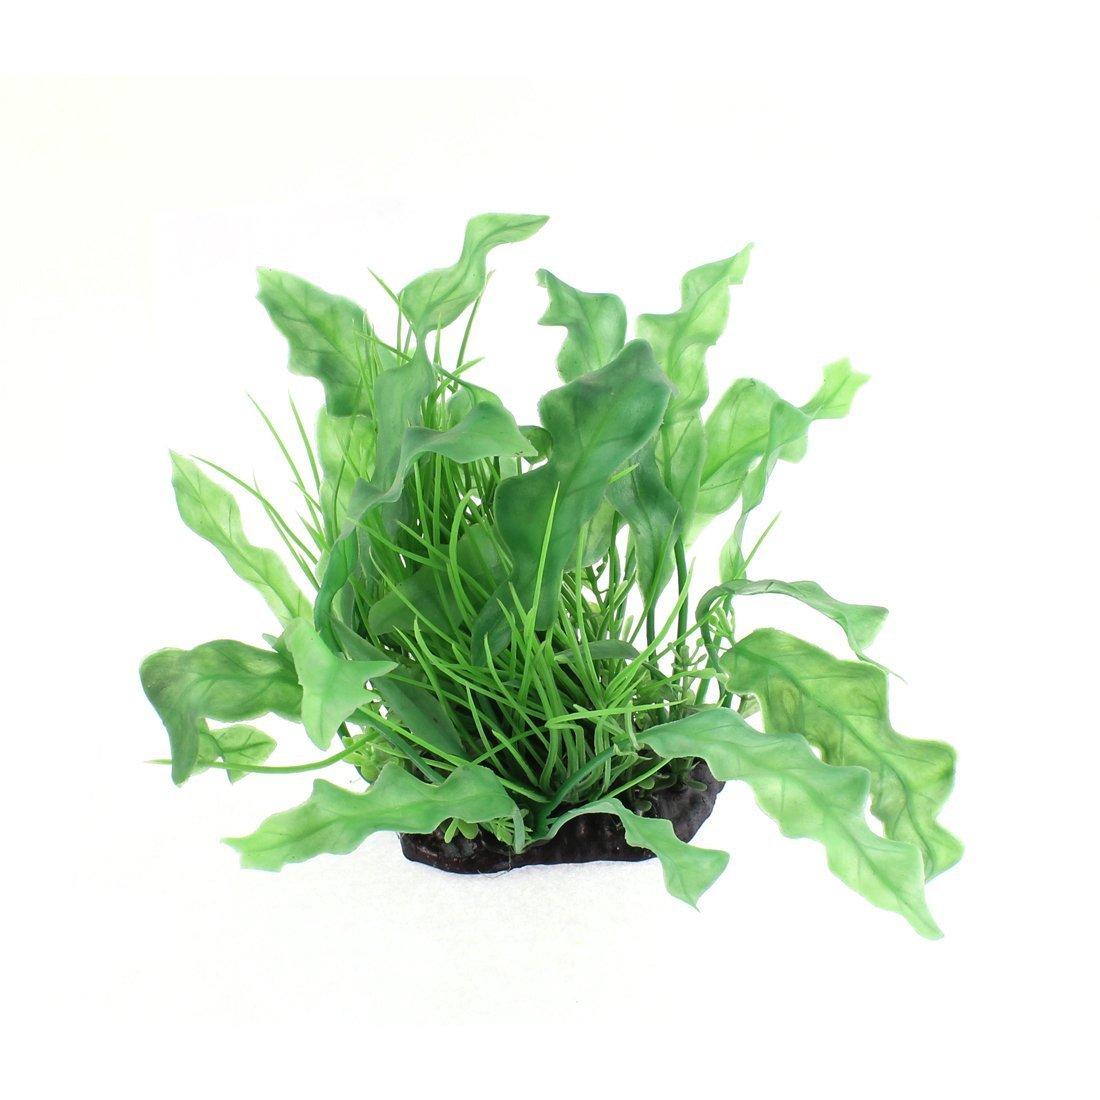 Plastic Fish Tank Grass Round Leaf for Aquarium, 15cm, Green Pink